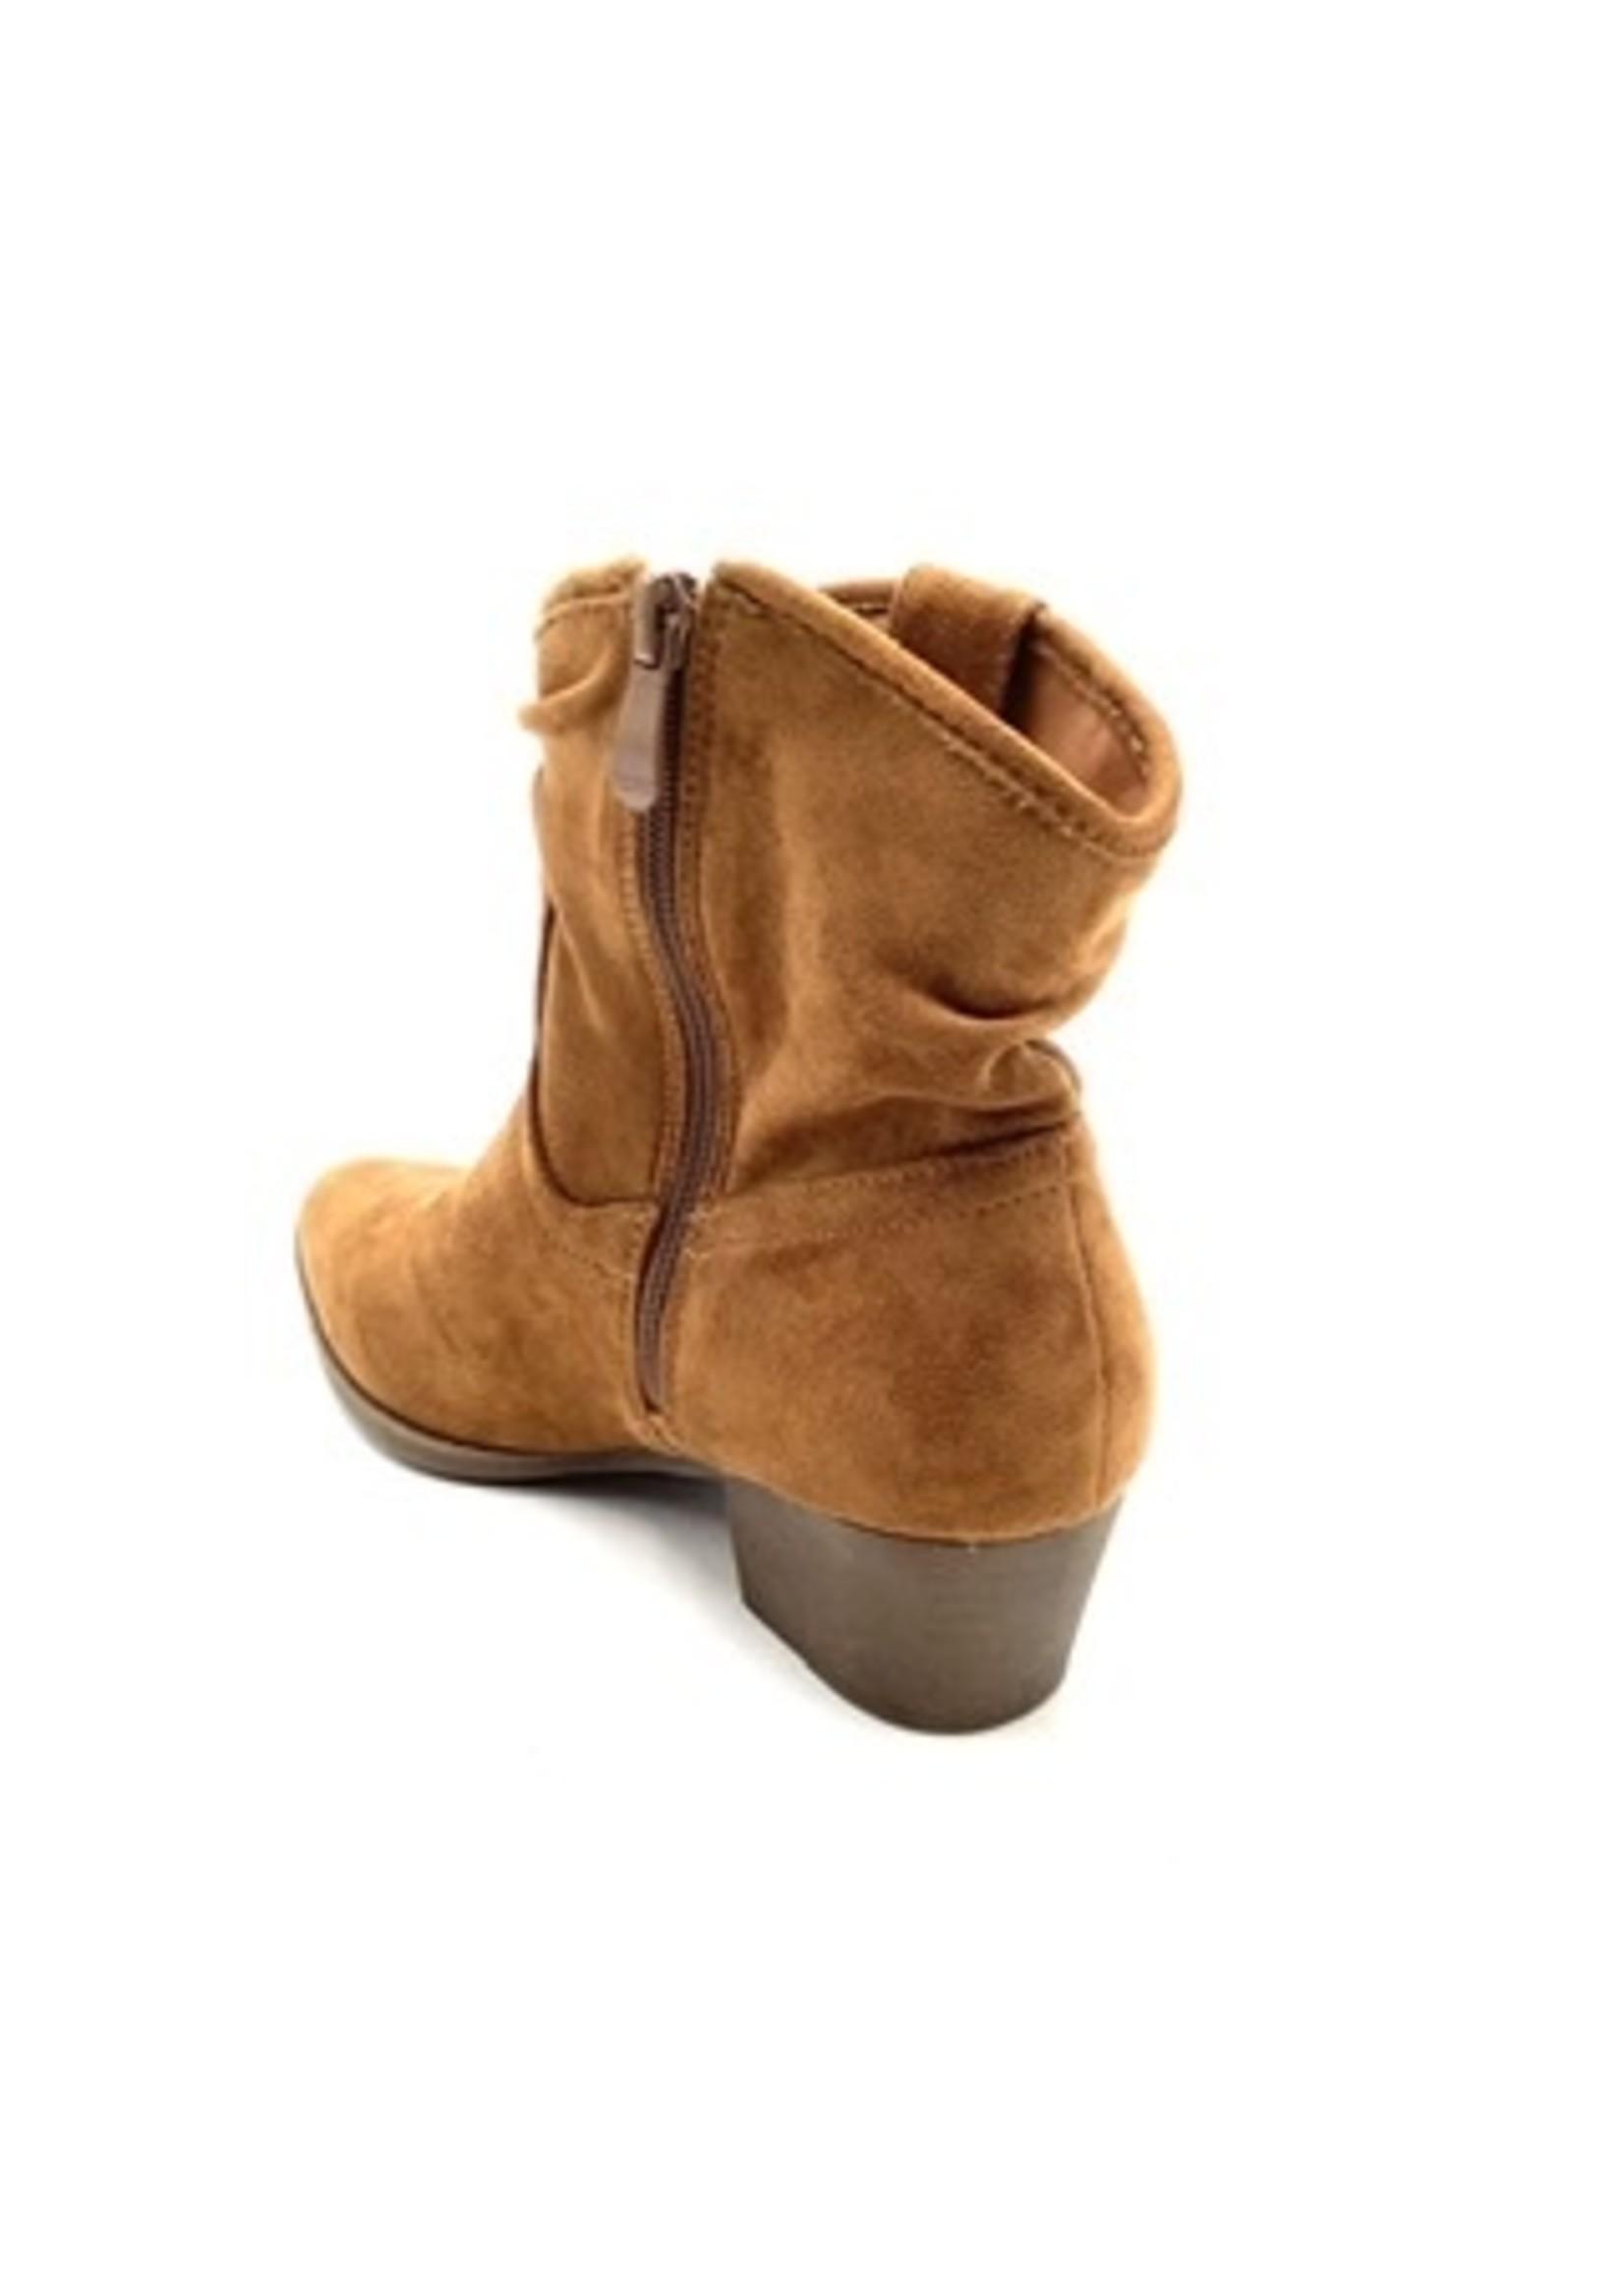 Camel boots